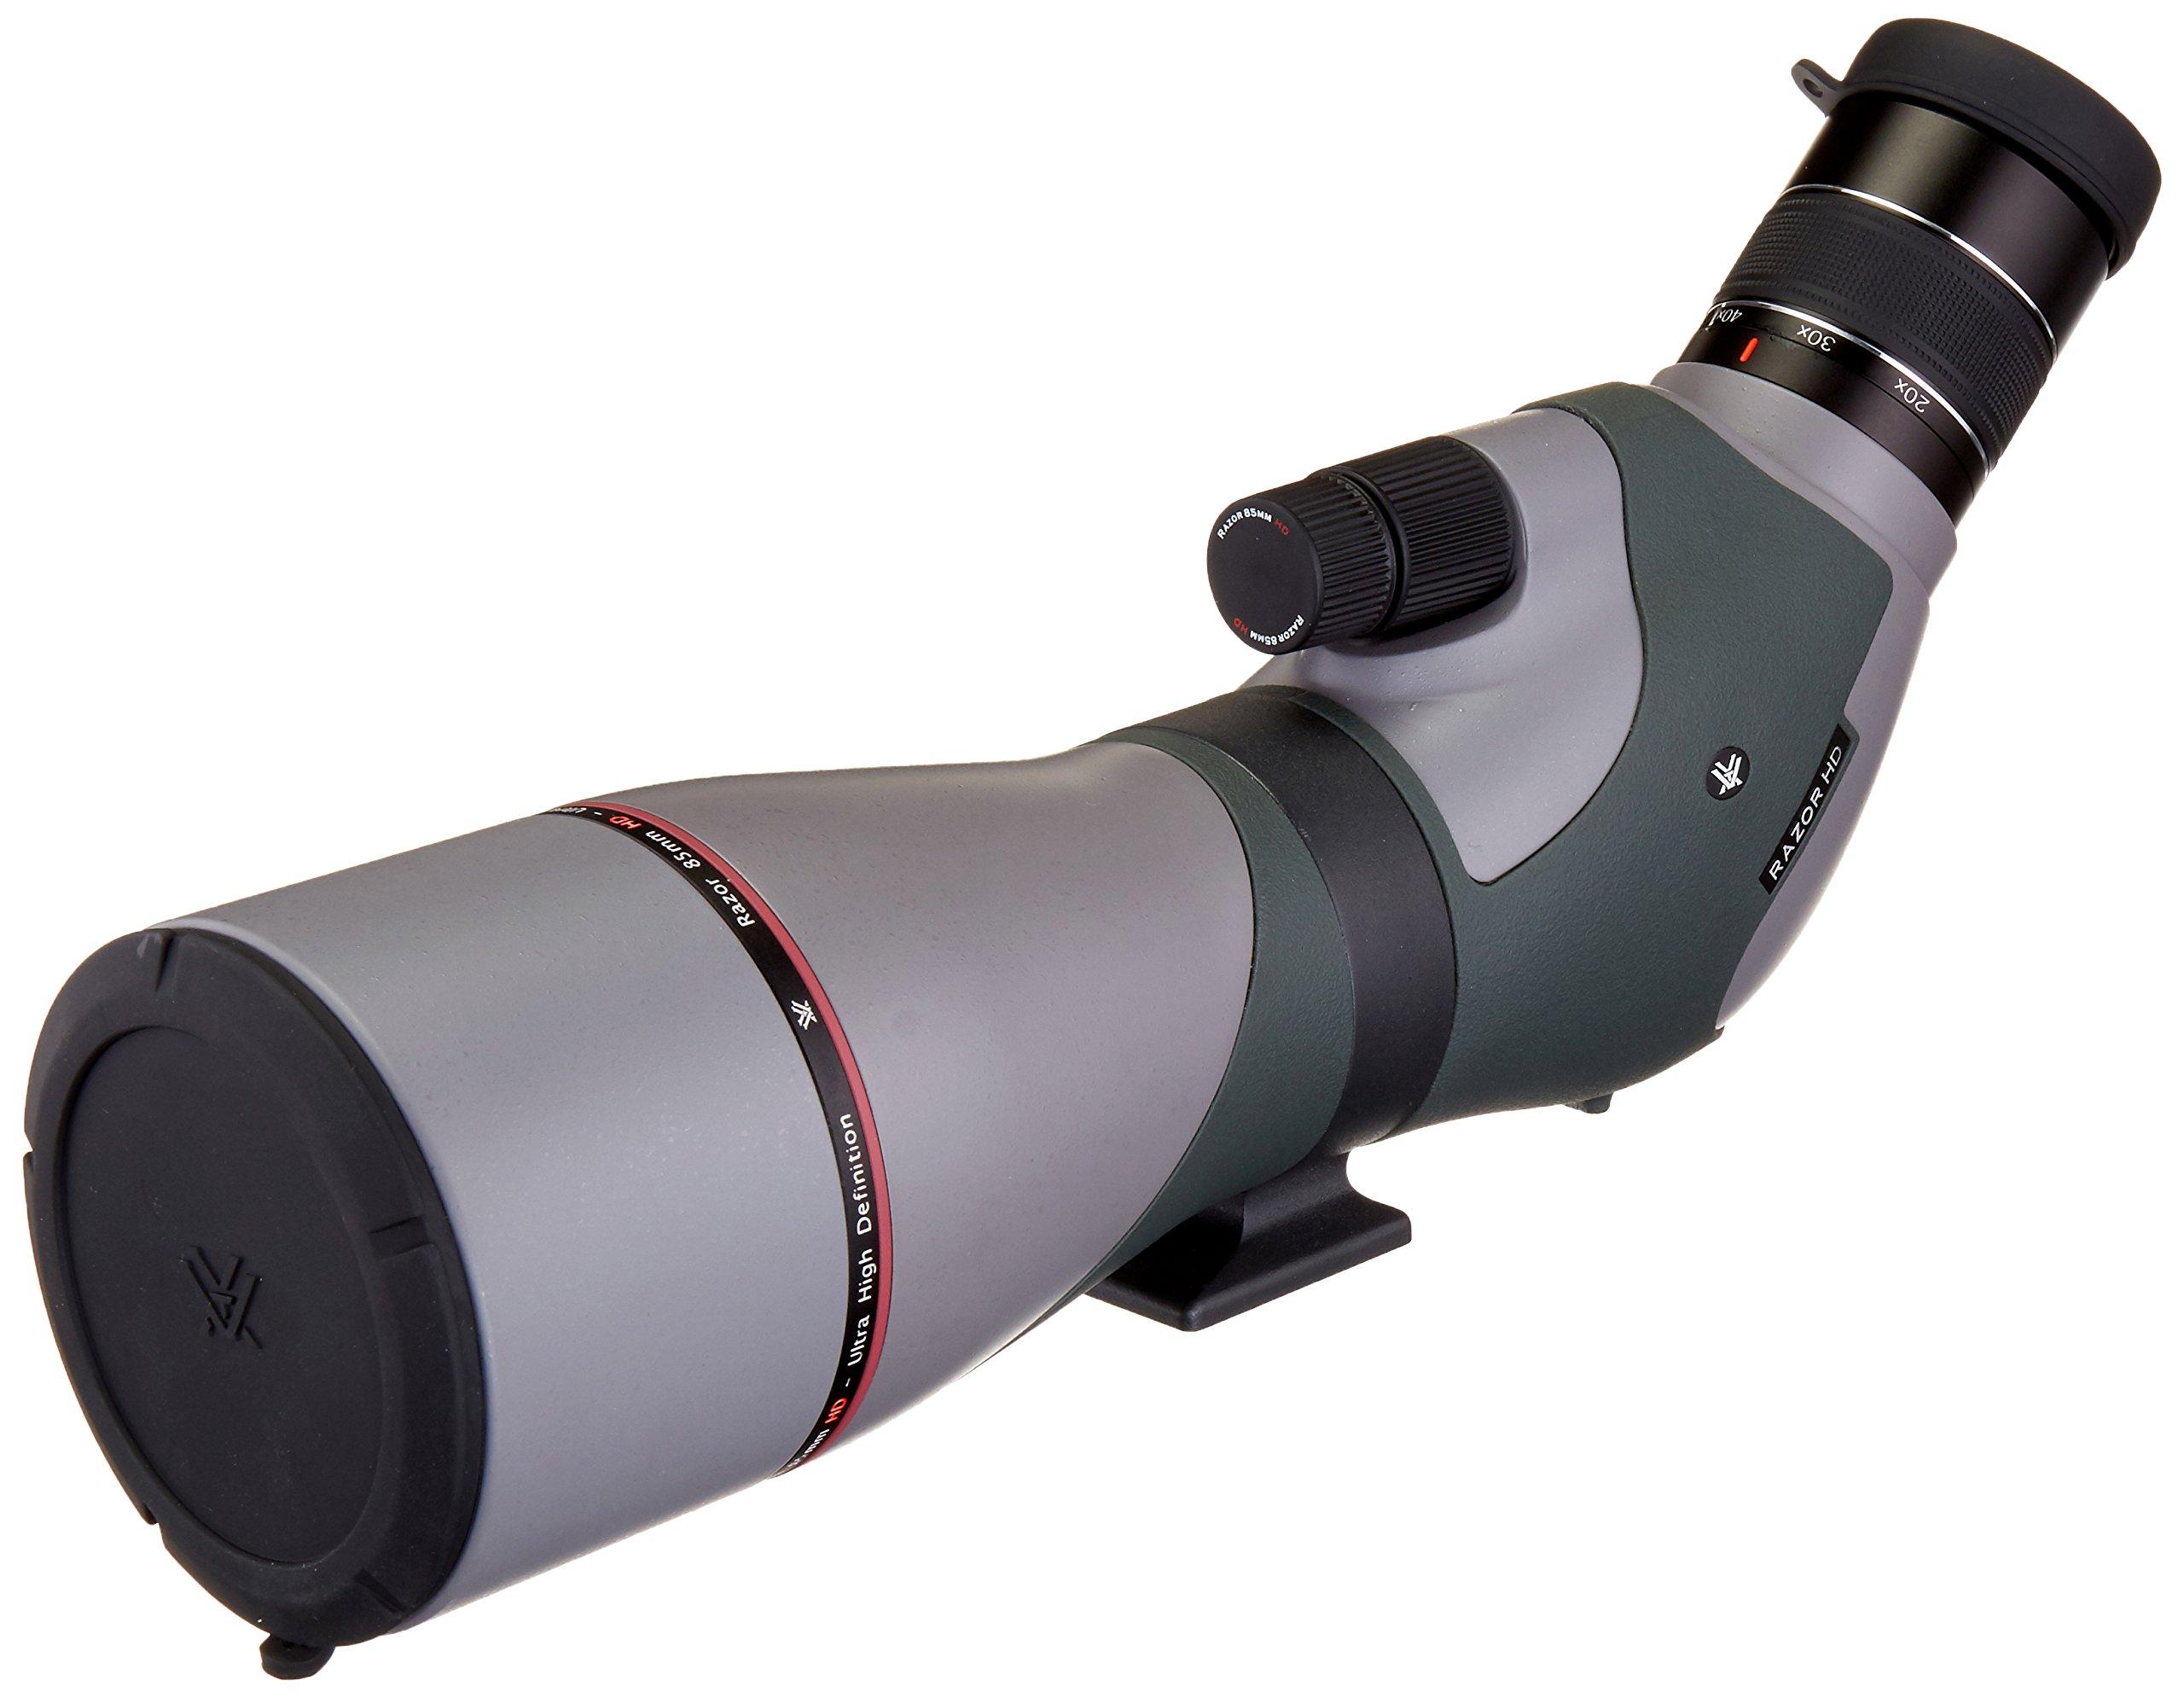 Vortex Optics Razor HD Angled Spotting Scope, 16-48x65 by Vortex Optics